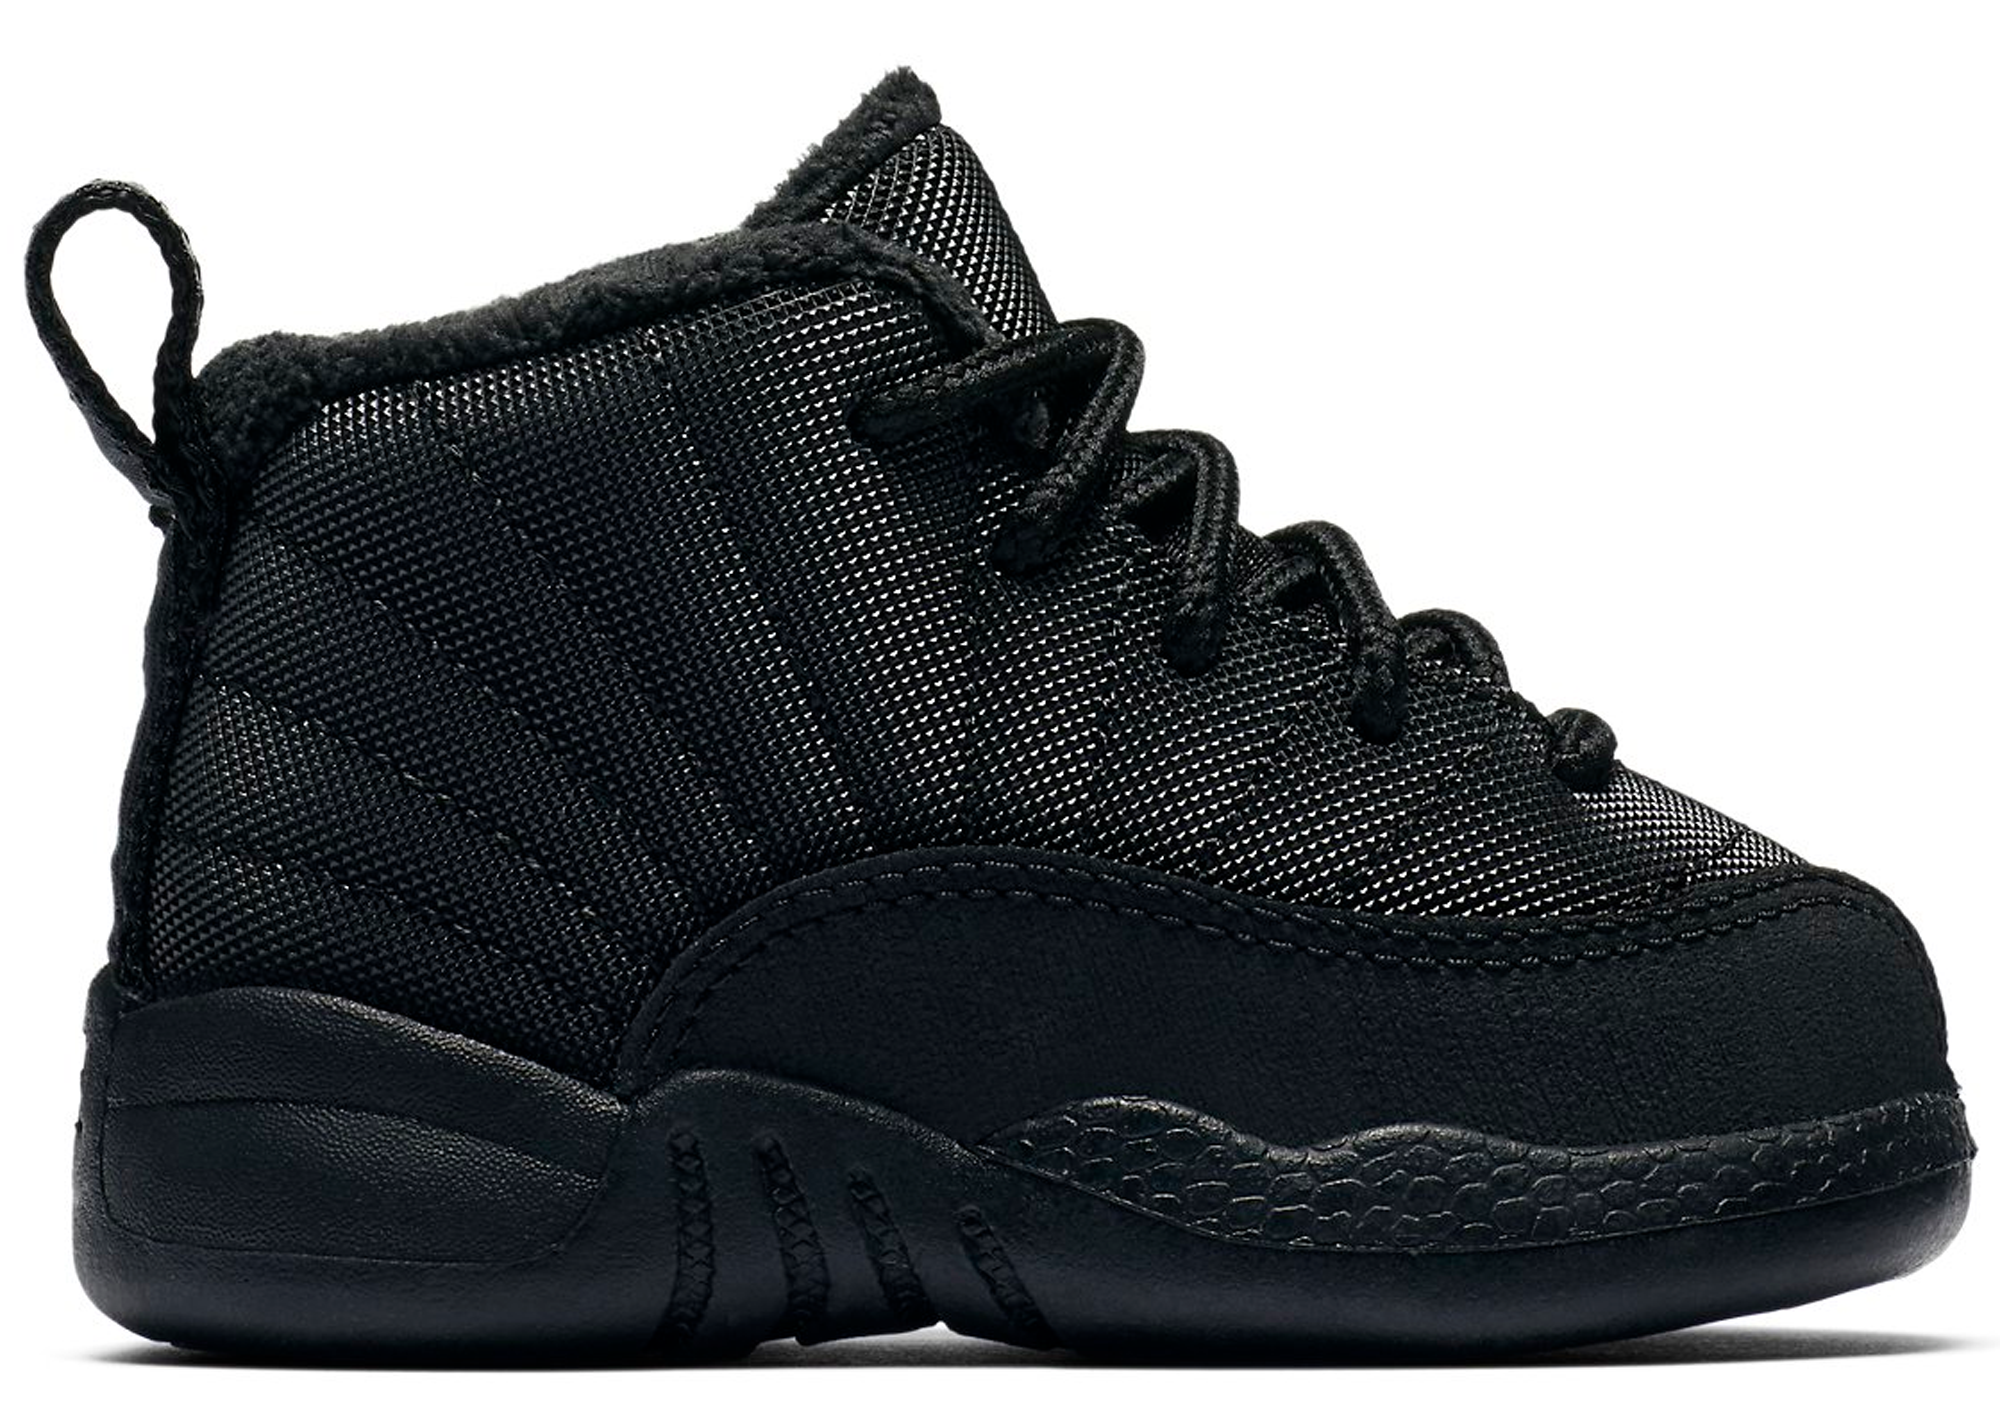 Jordan 12 Retro Winter Black (TD